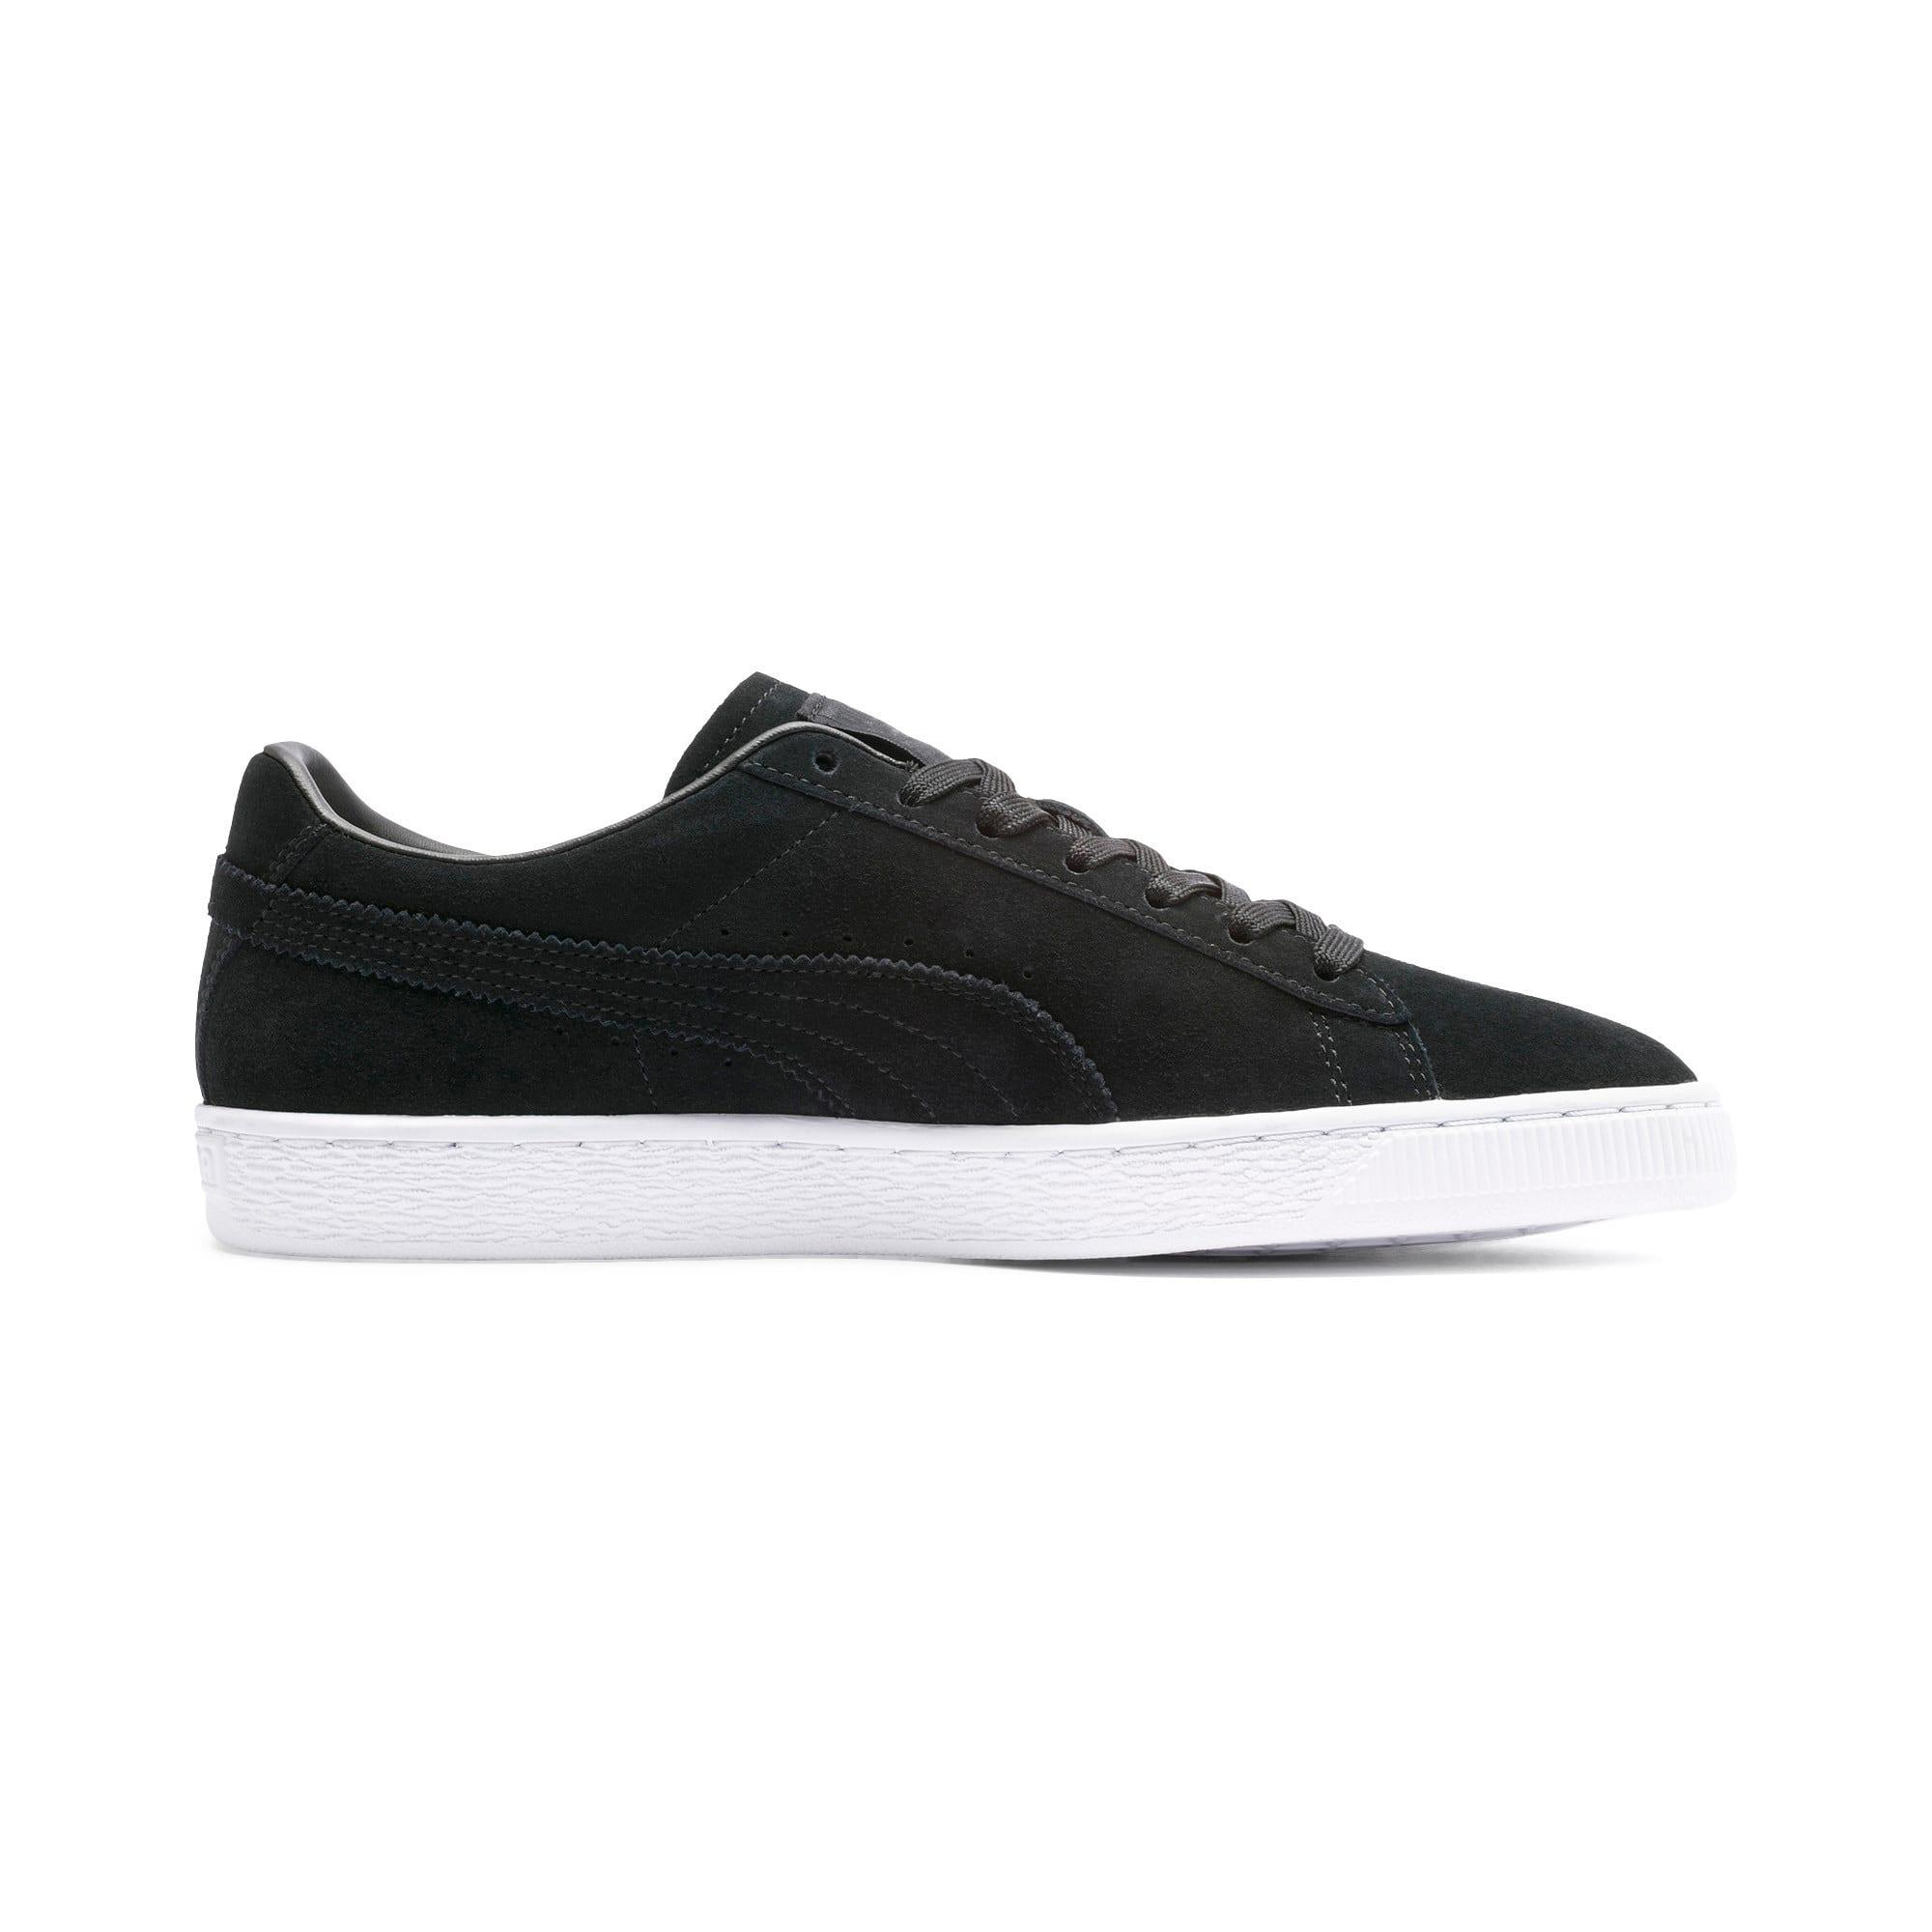 Thumbnail 6 of Suede Ripped Denim Sneakers, Puma Black-P Black-P White, medium